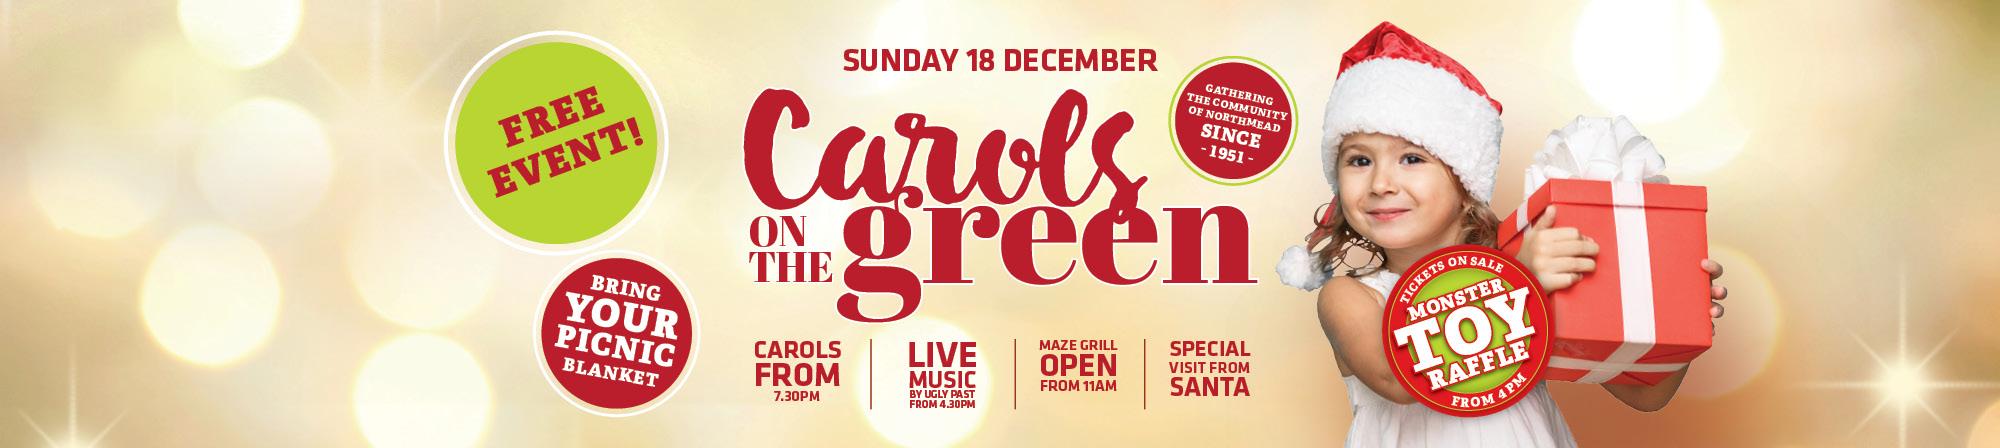 Carols-on-the-Green-Slide-2000x448